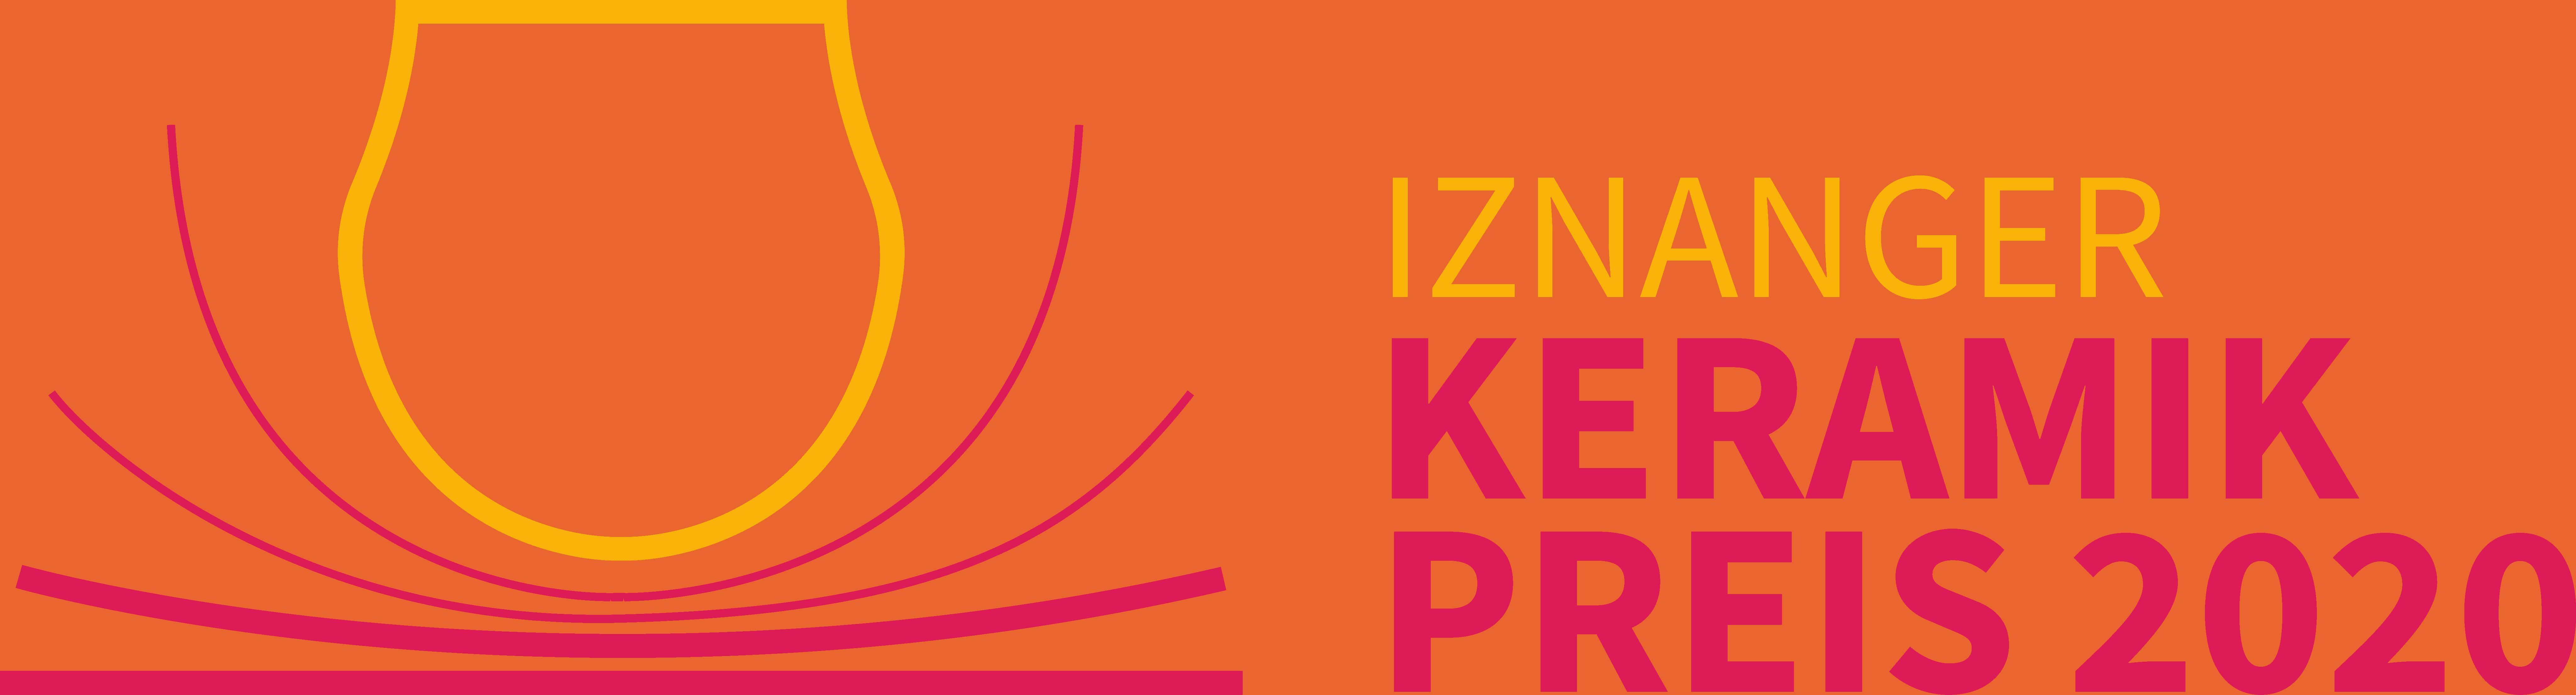 Iznanger-keramik-preis-2020-logo